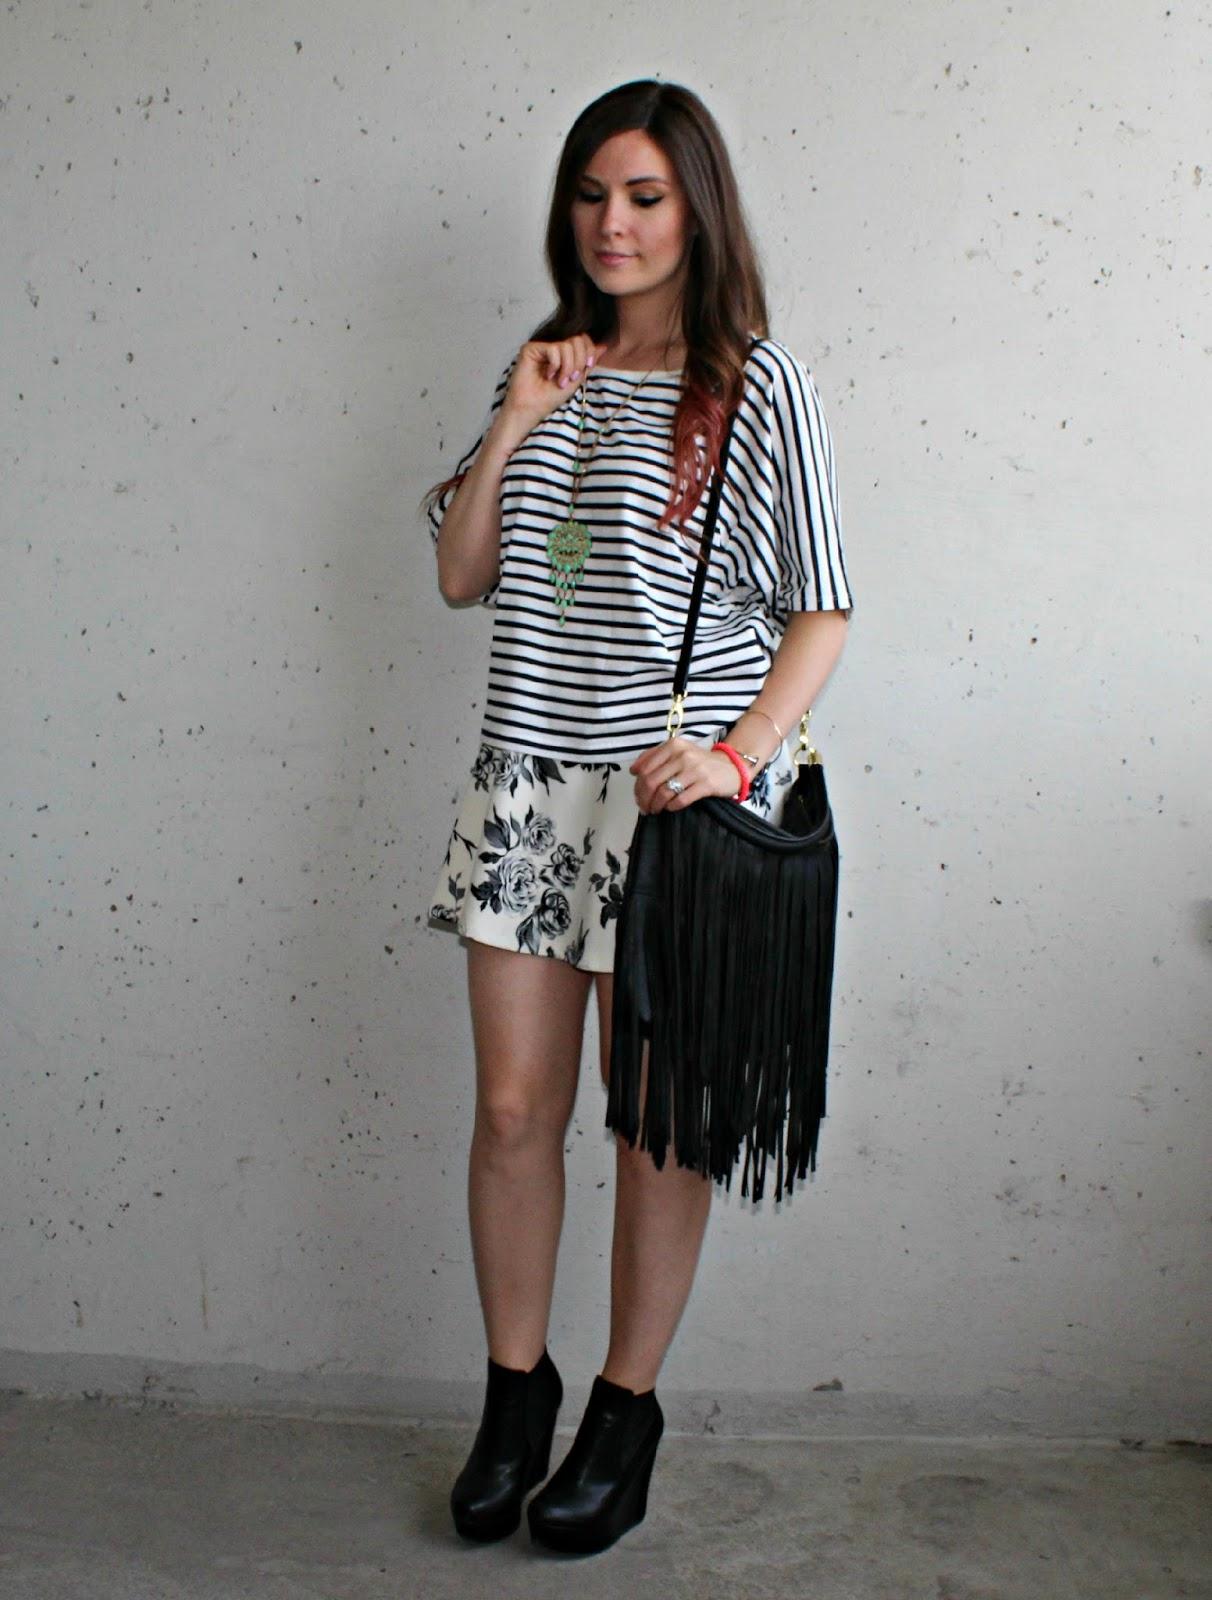 nautical stripe t-shirt, floral skirt, denim shorts, fringe purse, wedge ankle boots